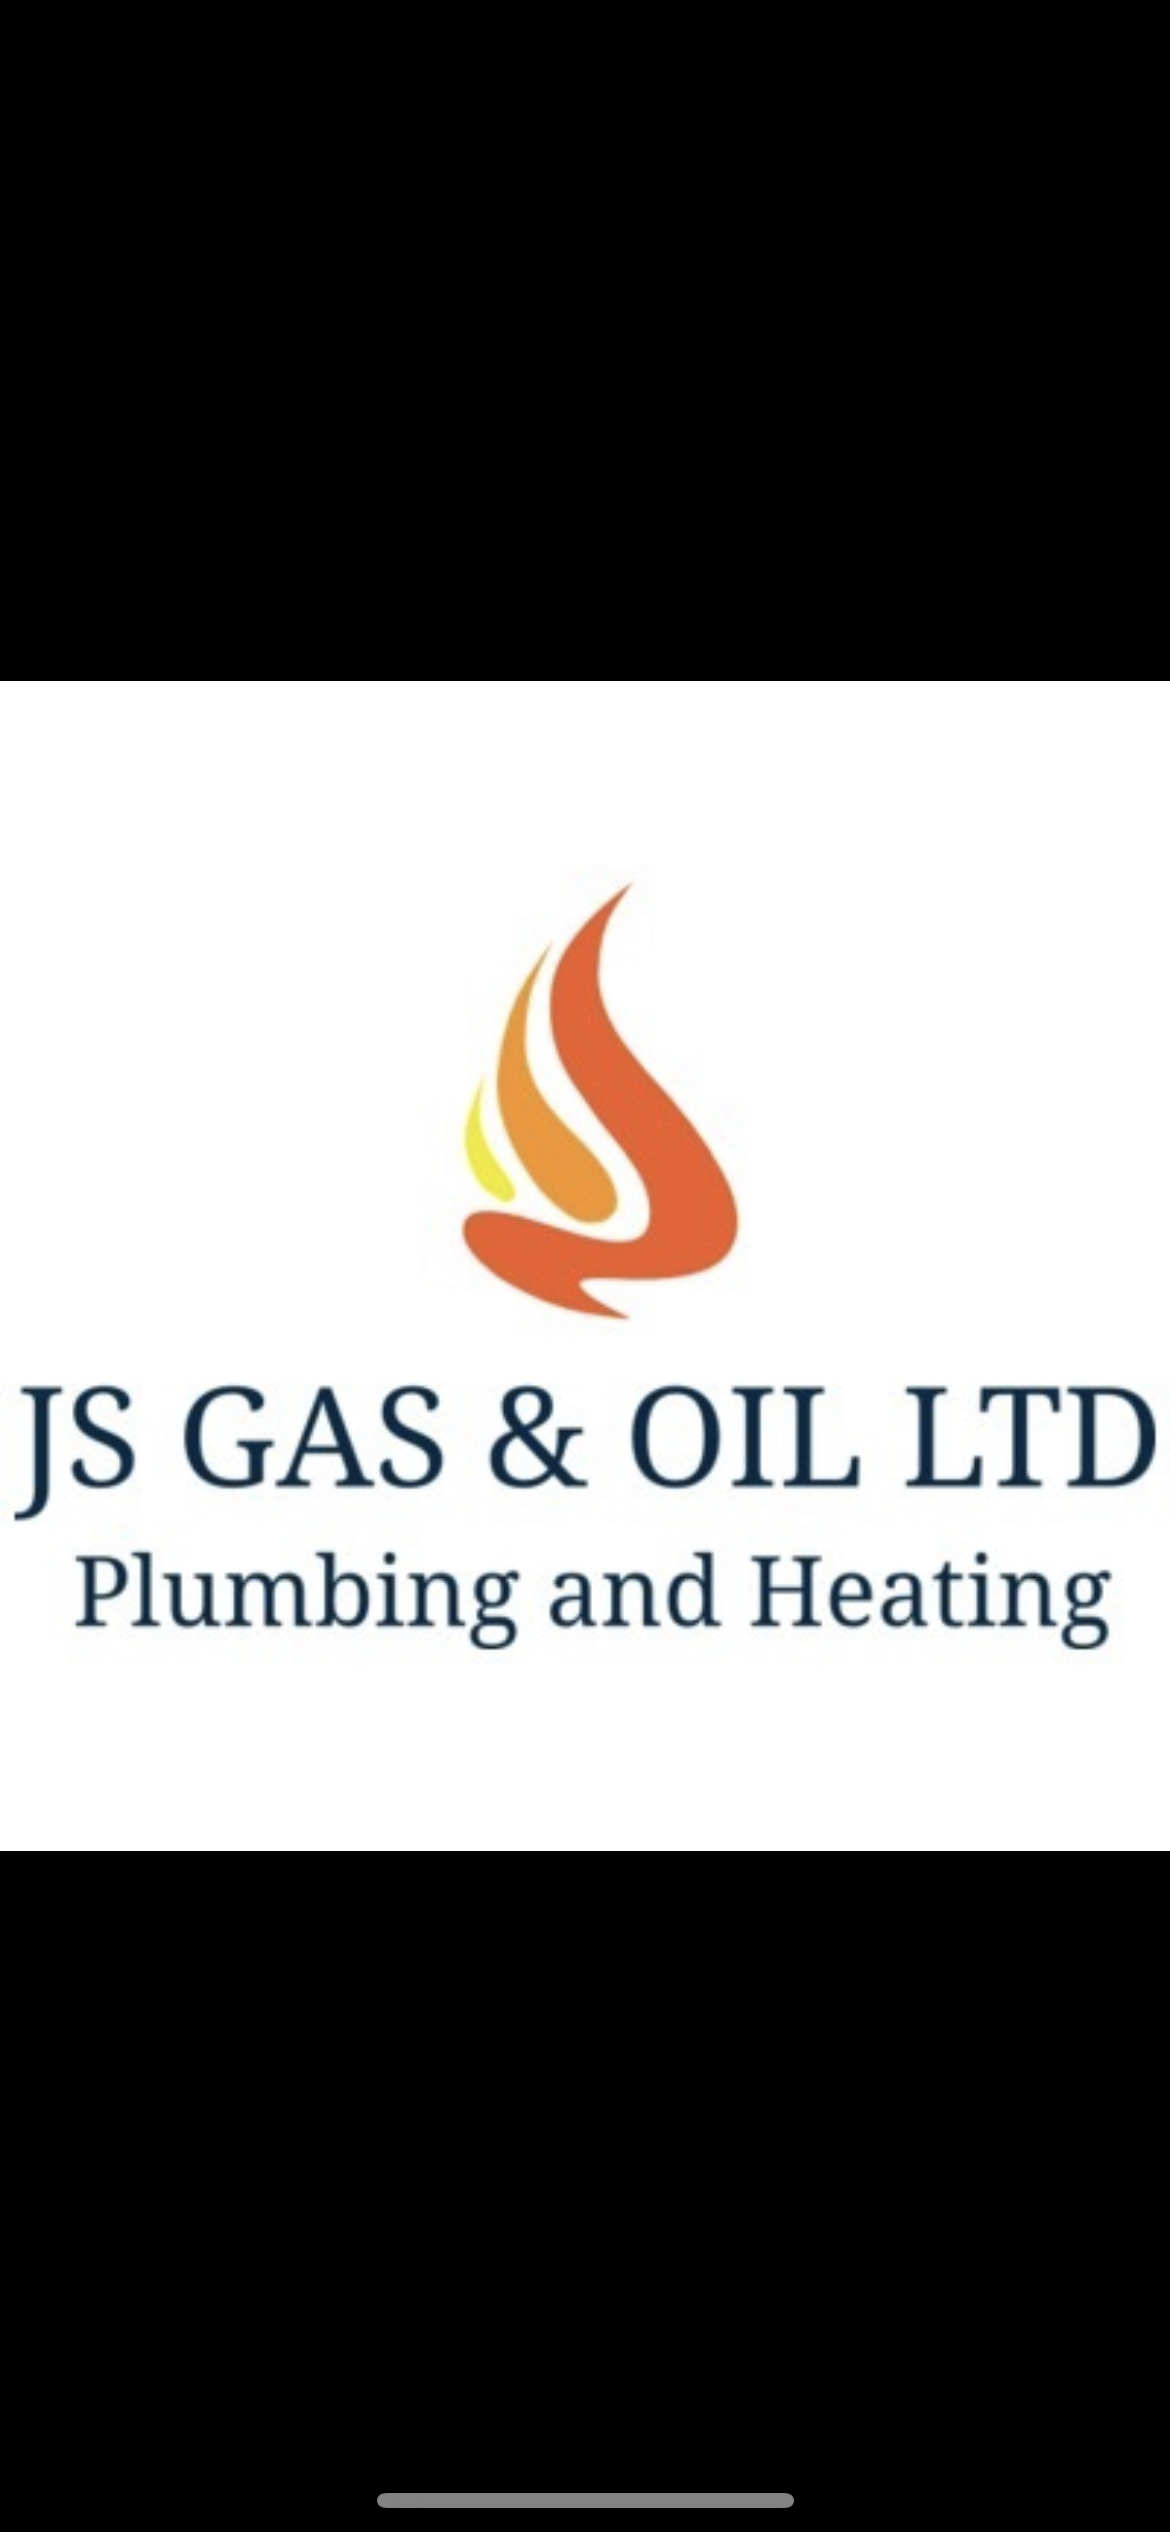 JS Gas & Oil Ltd Verified Logo